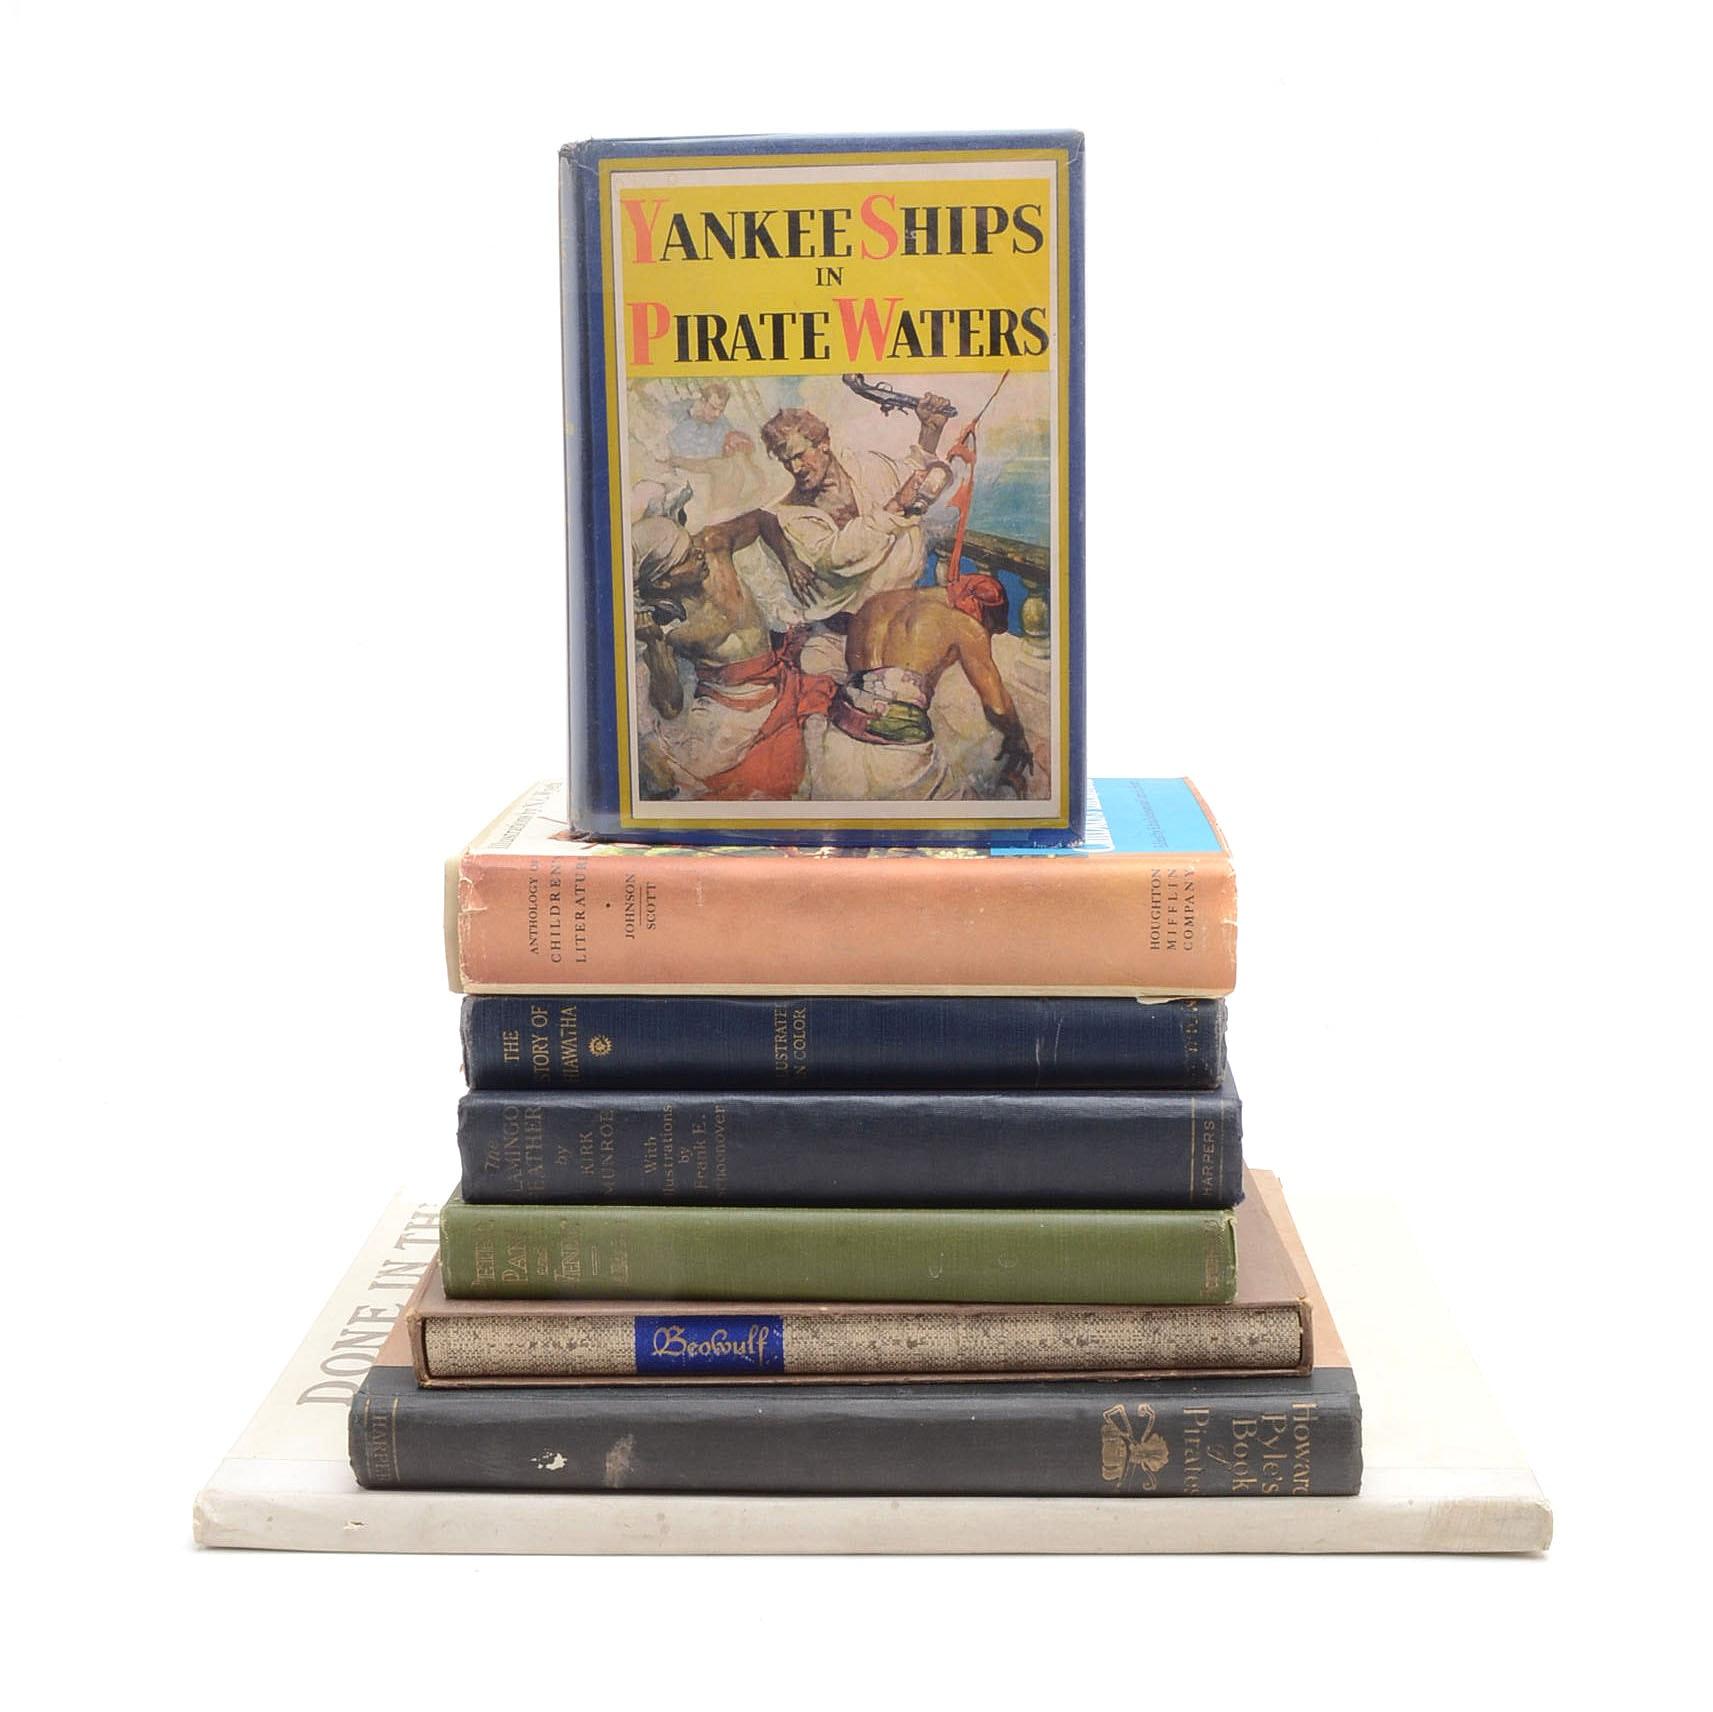 Group of Vintage Illustrated Children's Books